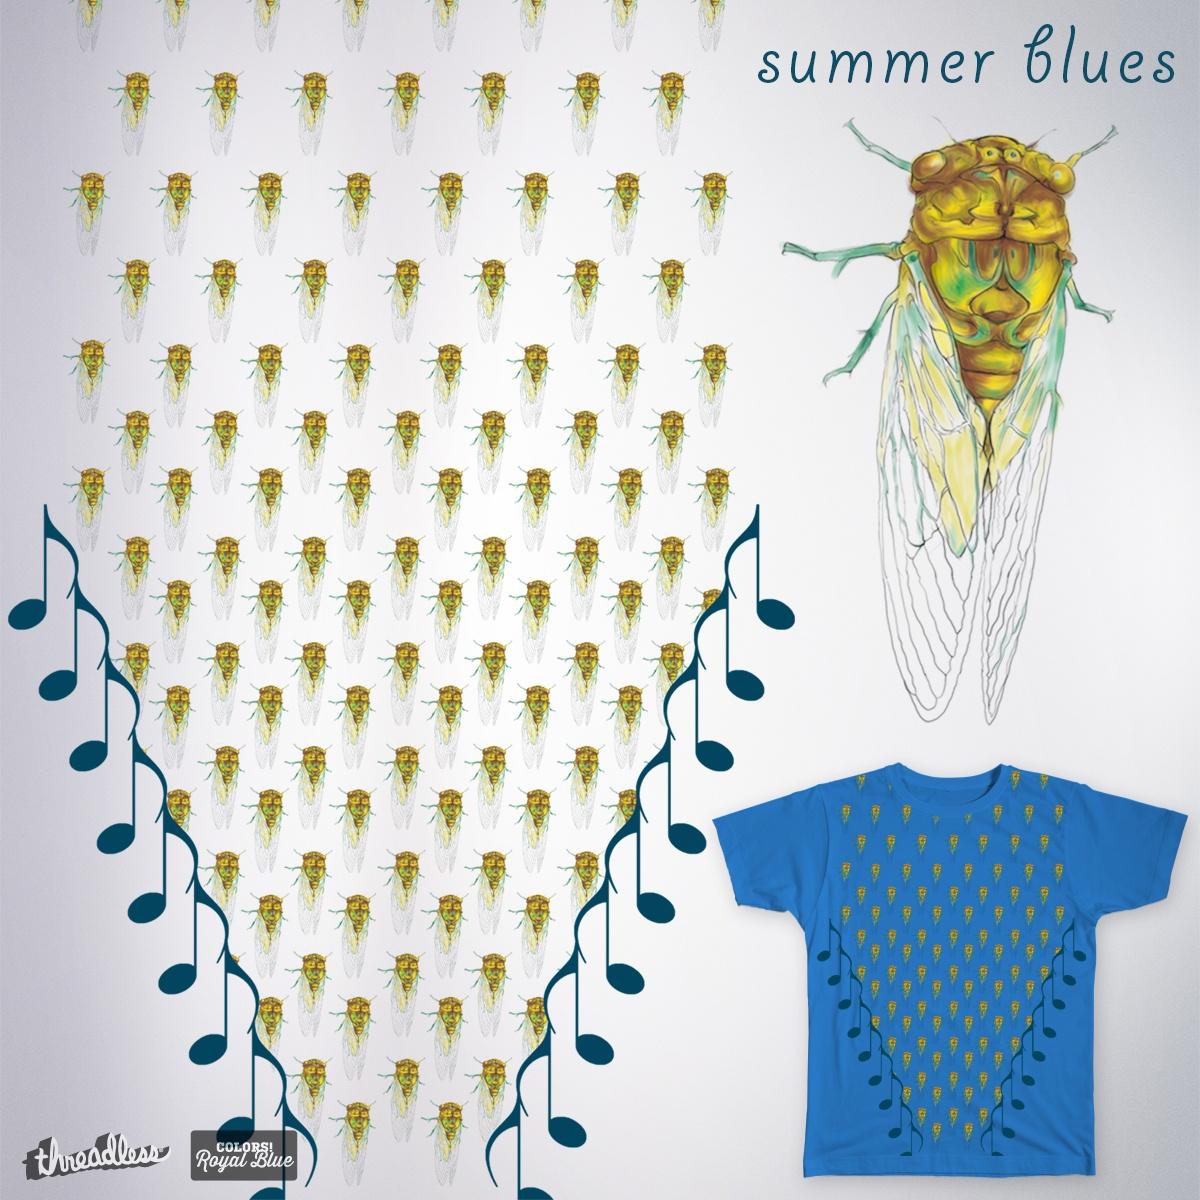 Summer Blues by RangoplanB on Threadless